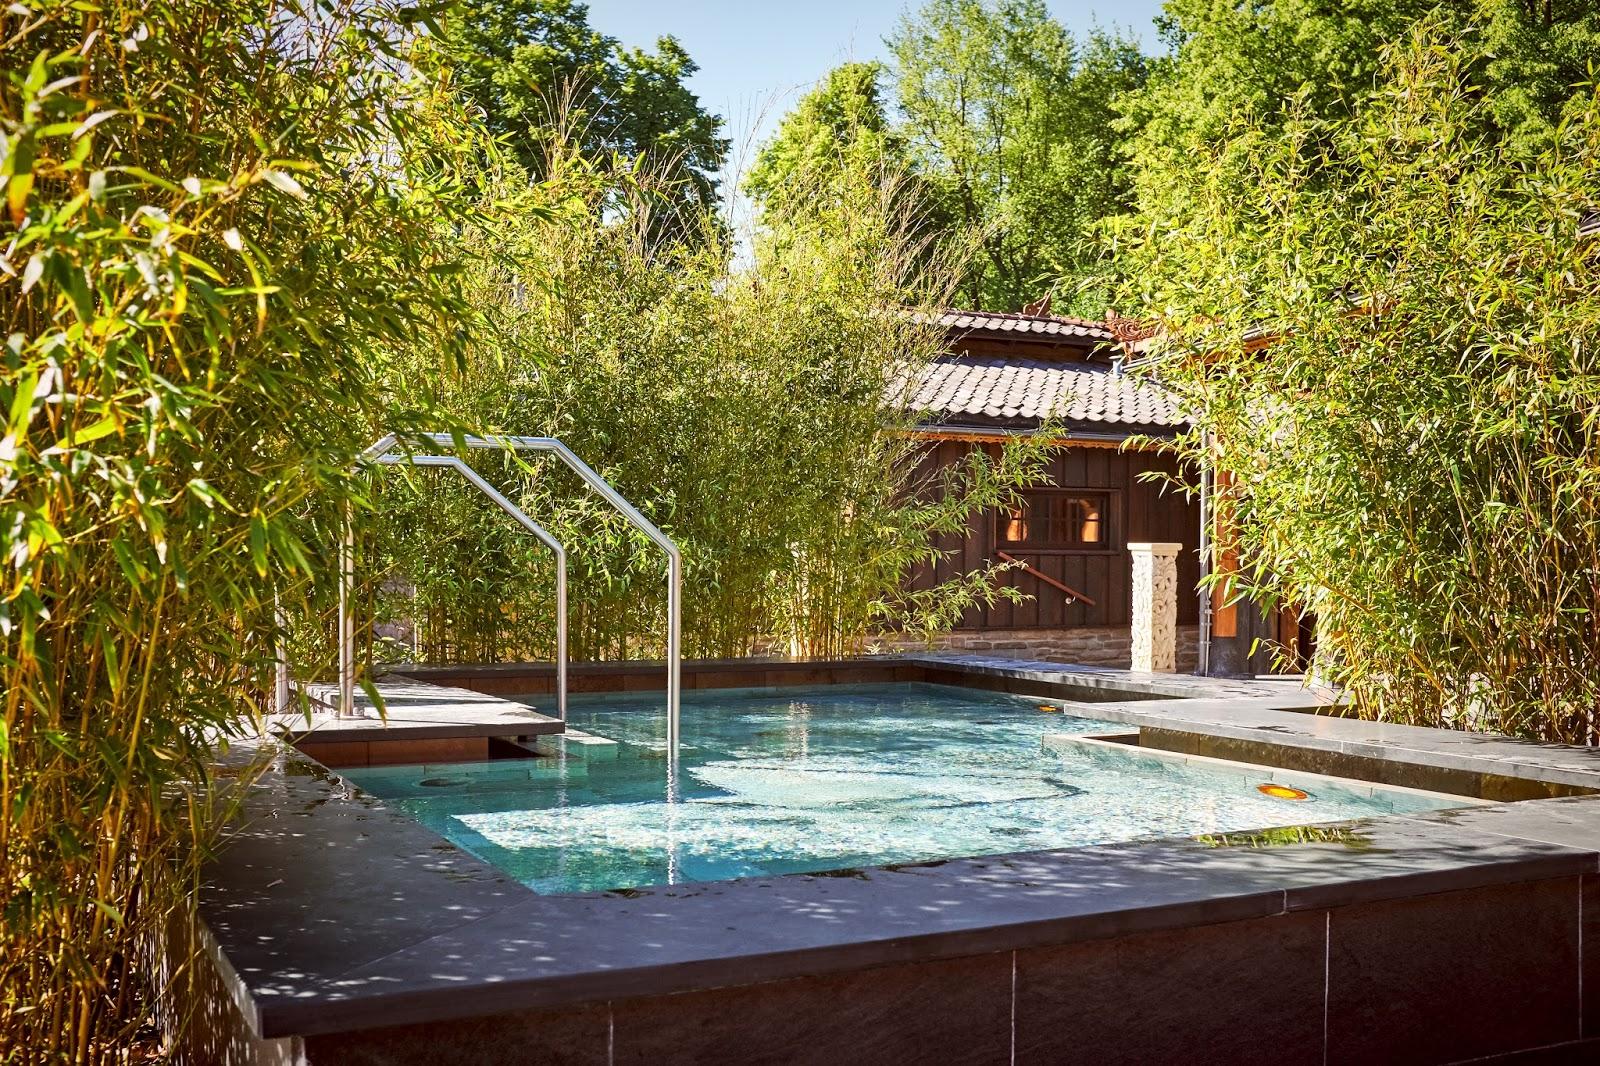 anneliwest berlin vabali spa eine oase in berlin moabit. Black Bedroom Furniture Sets. Home Design Ideas